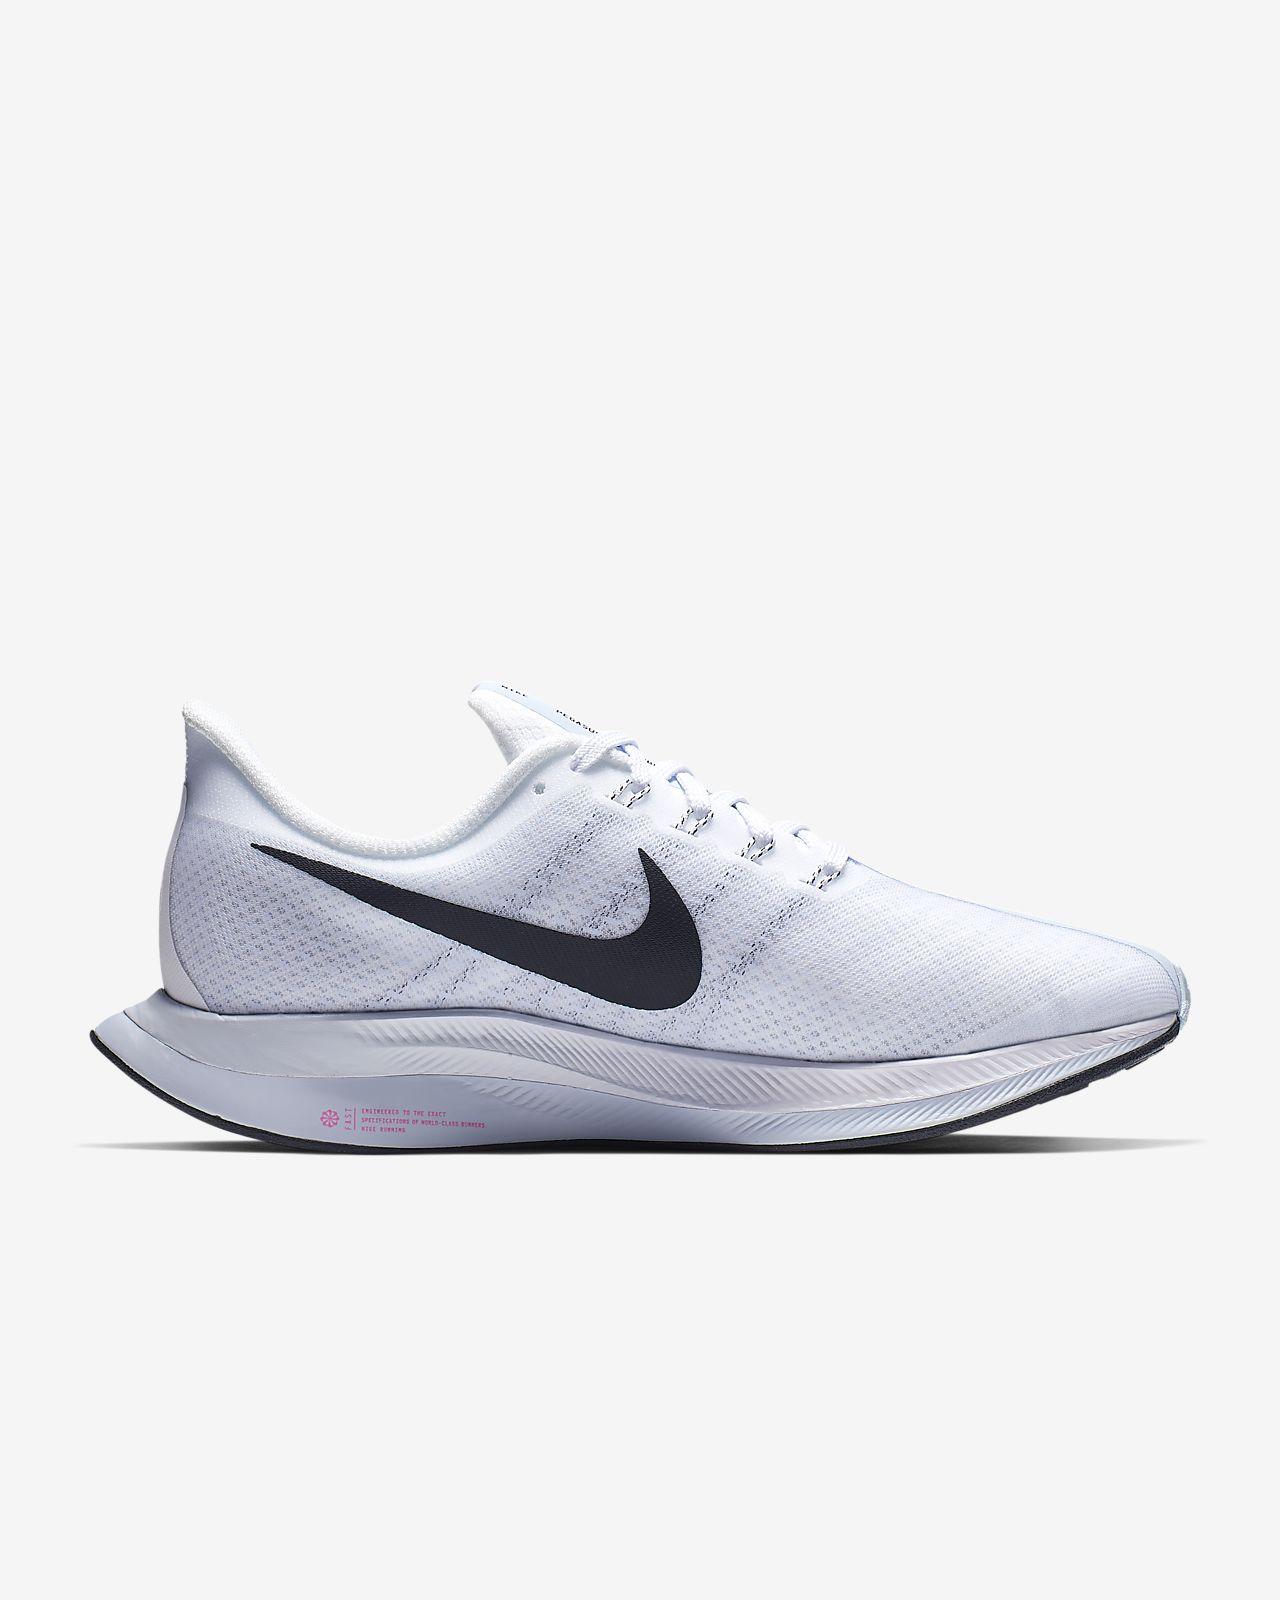 online store 91d92 5824a Nike Zoom Pegasus Turbo Women's Running Shoe